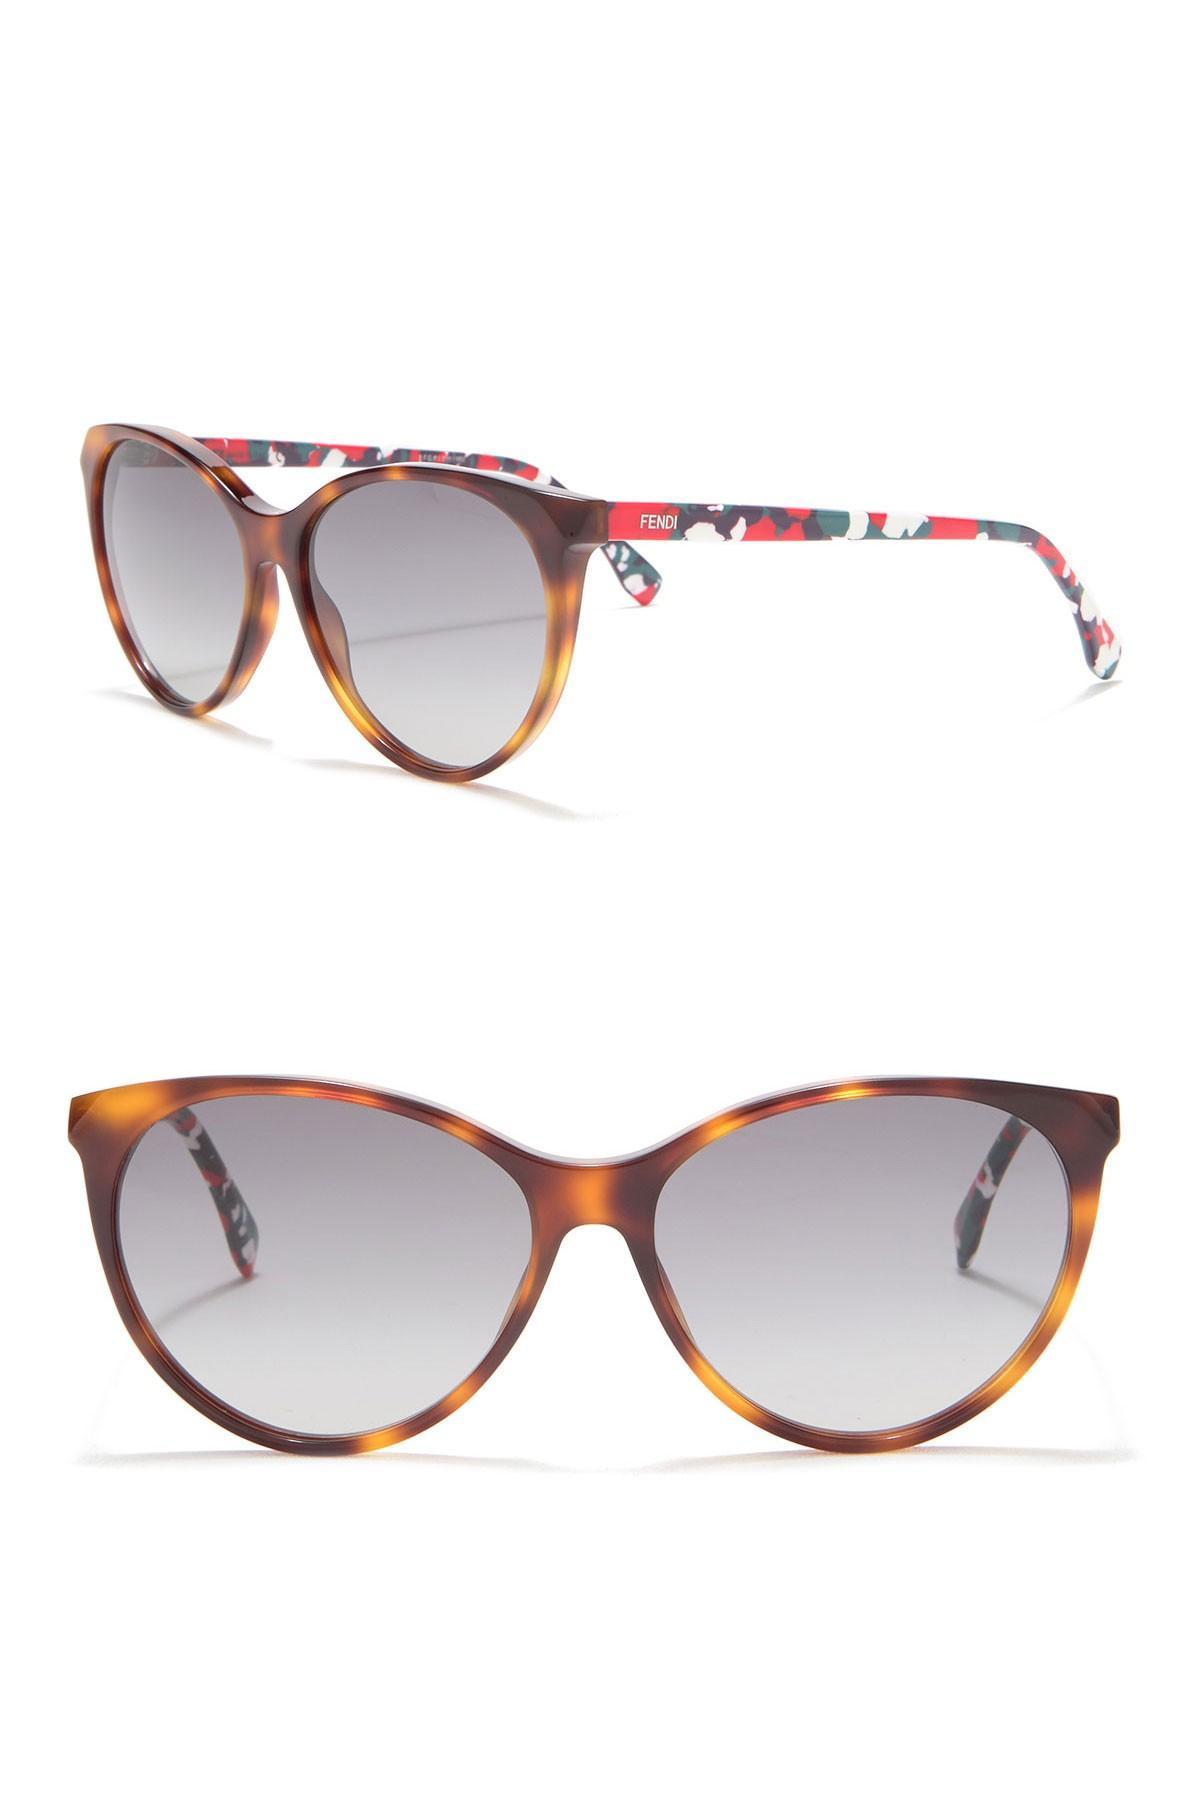 a7493815803 Fendi - Multicolor 57mm Rounded Cat Eye Sunglasses - Lyst. View fullscreen